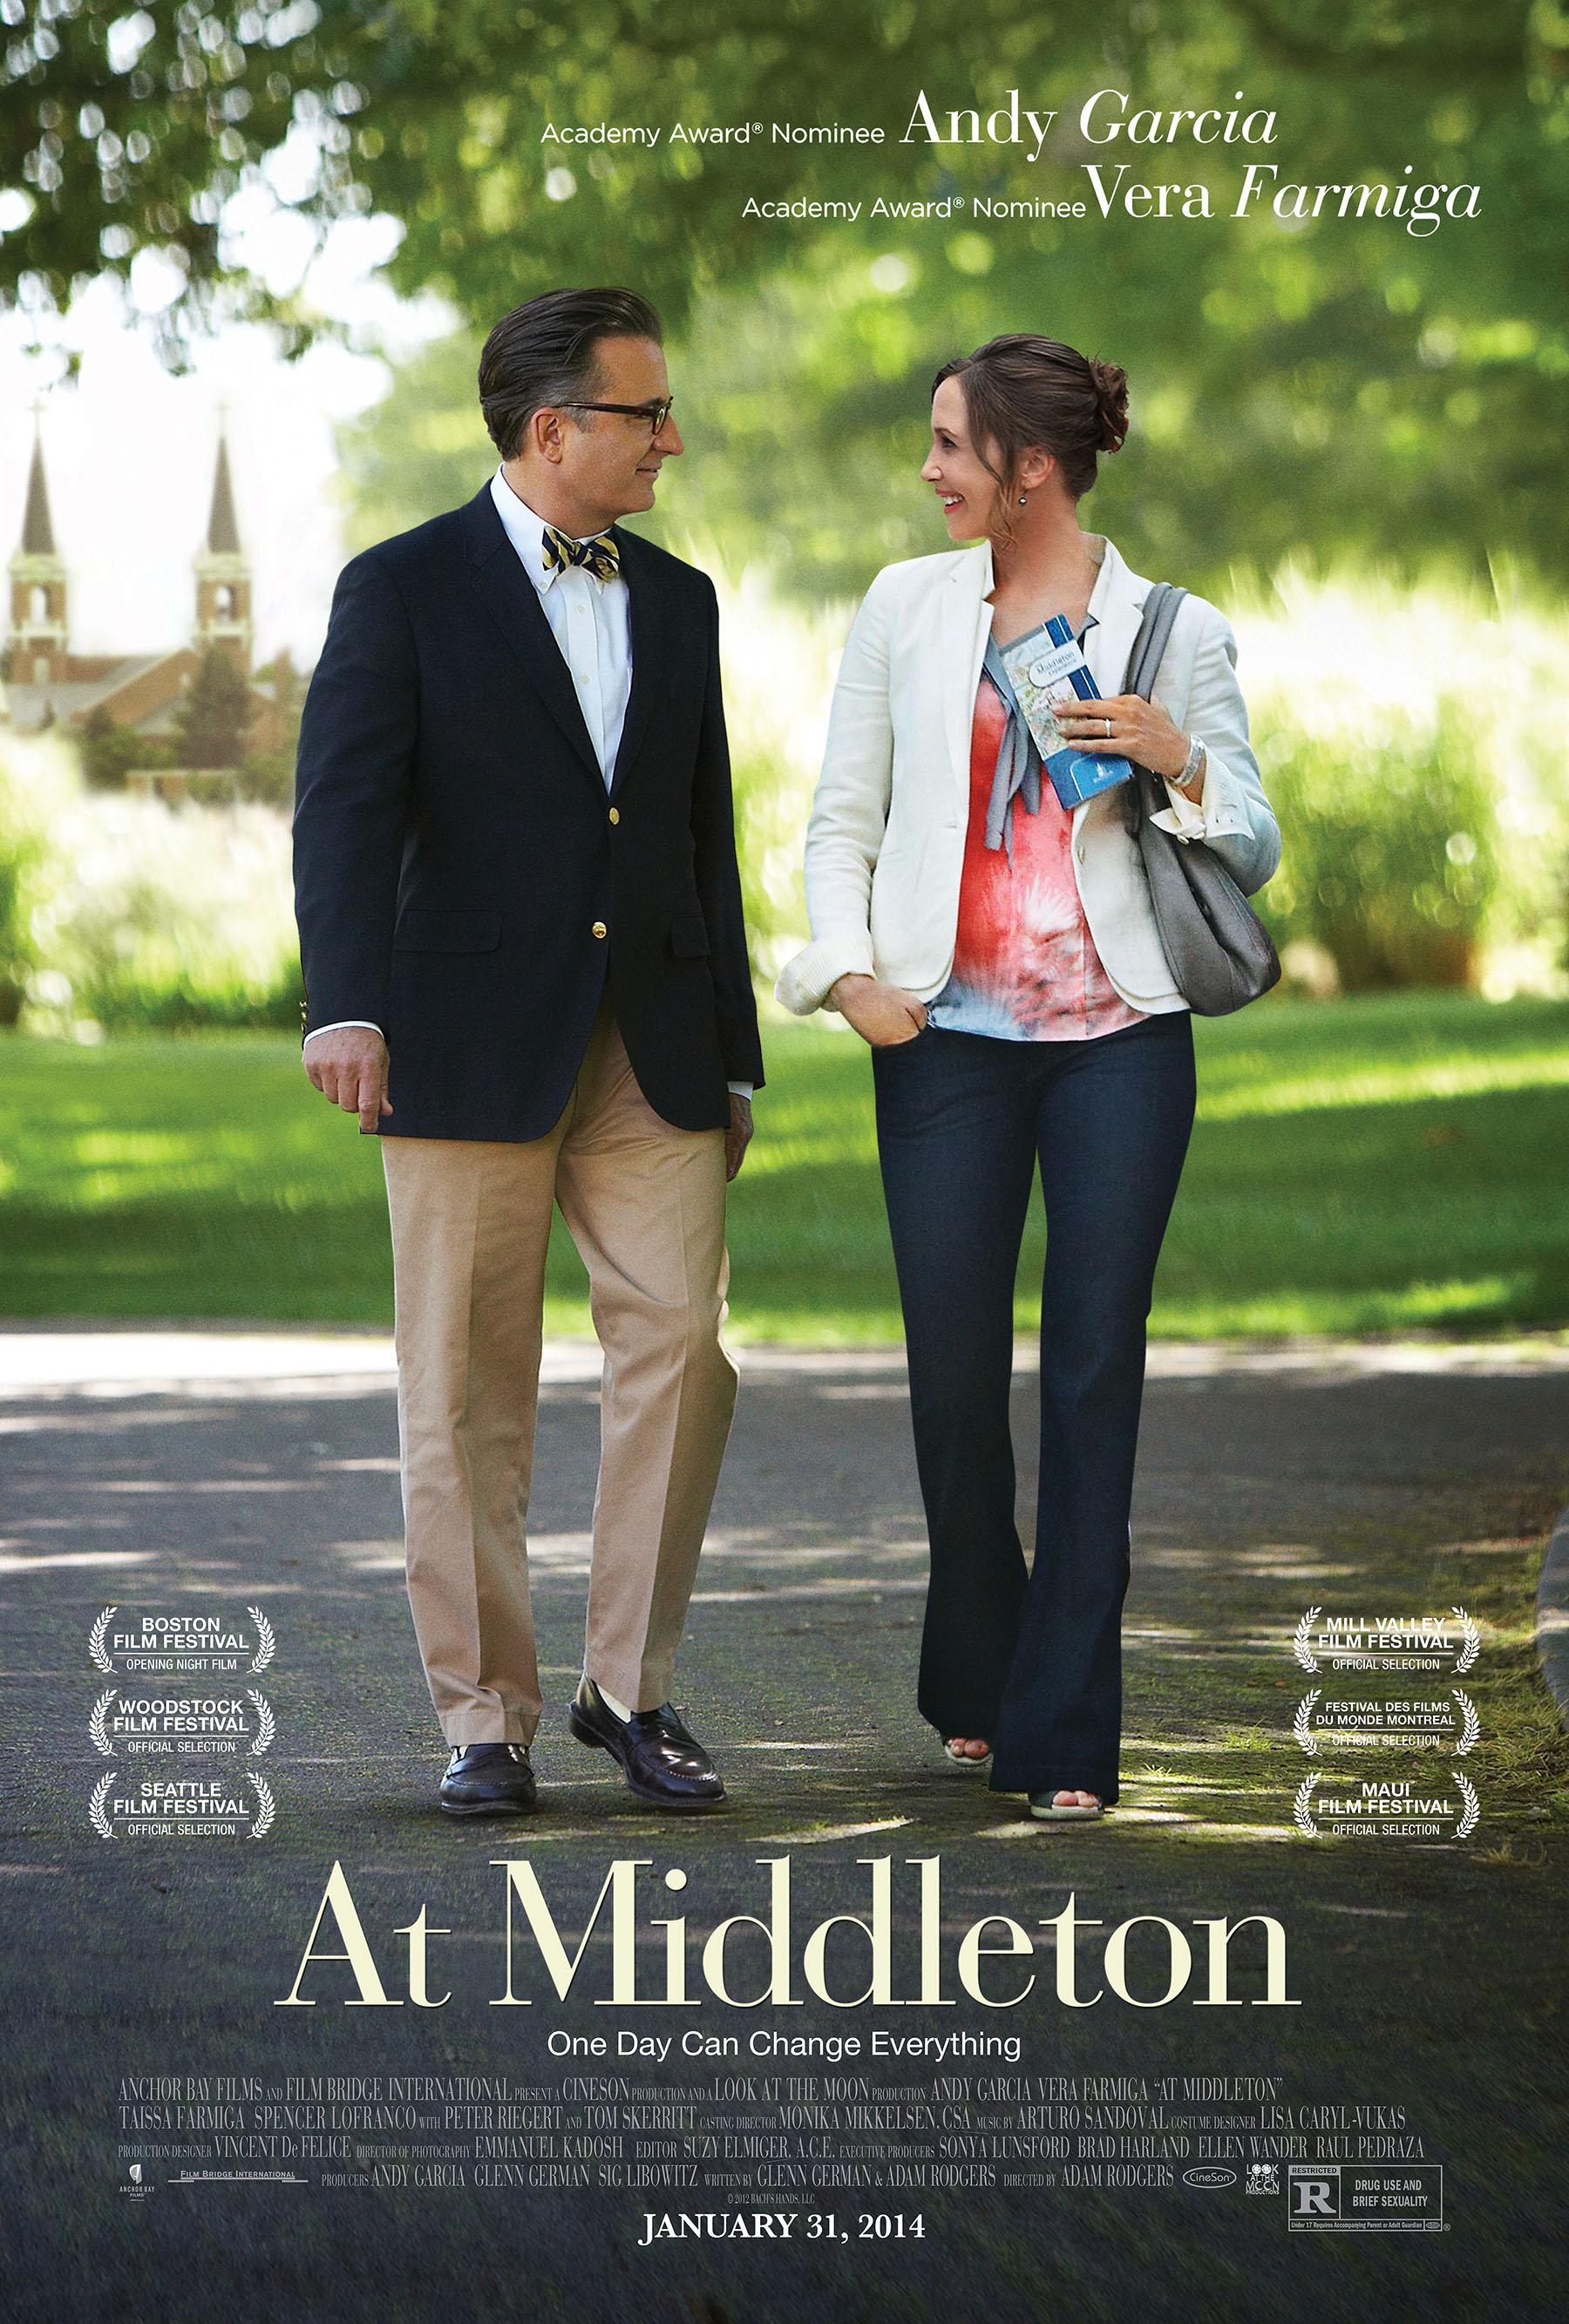 At Middleton Theatrical Poster (1).jpg